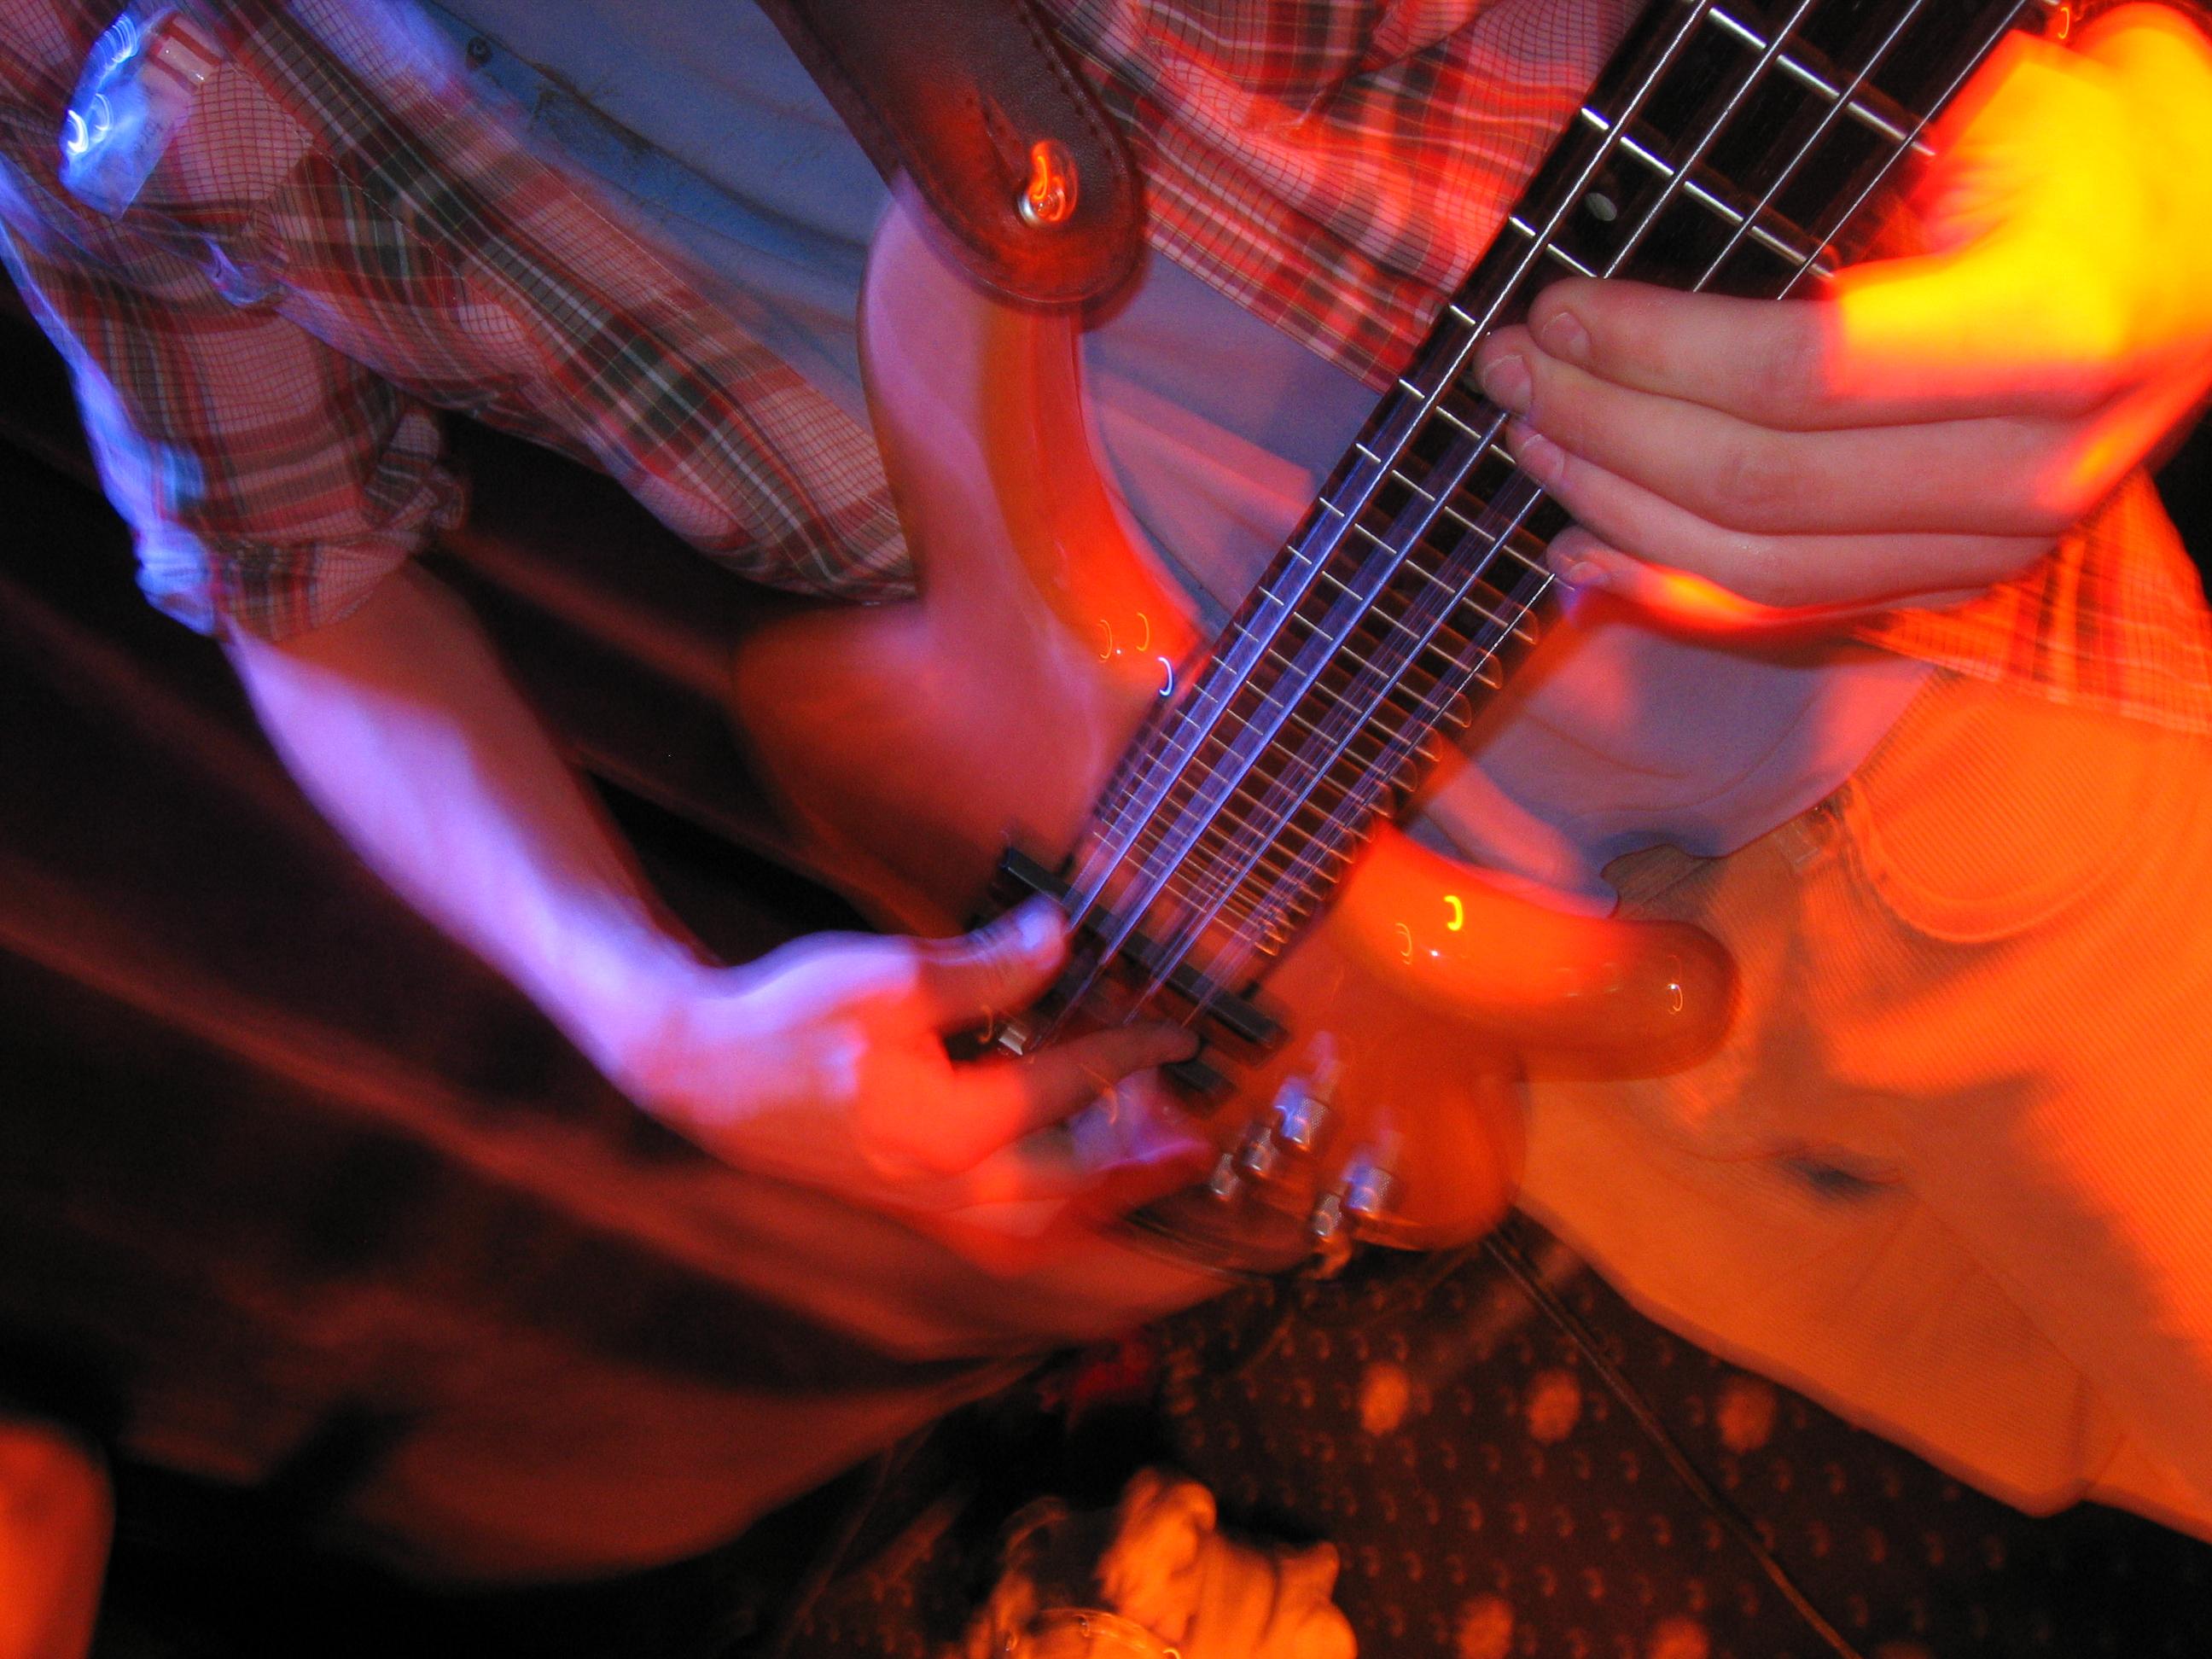 File:Gig bass.jpg - Wi...